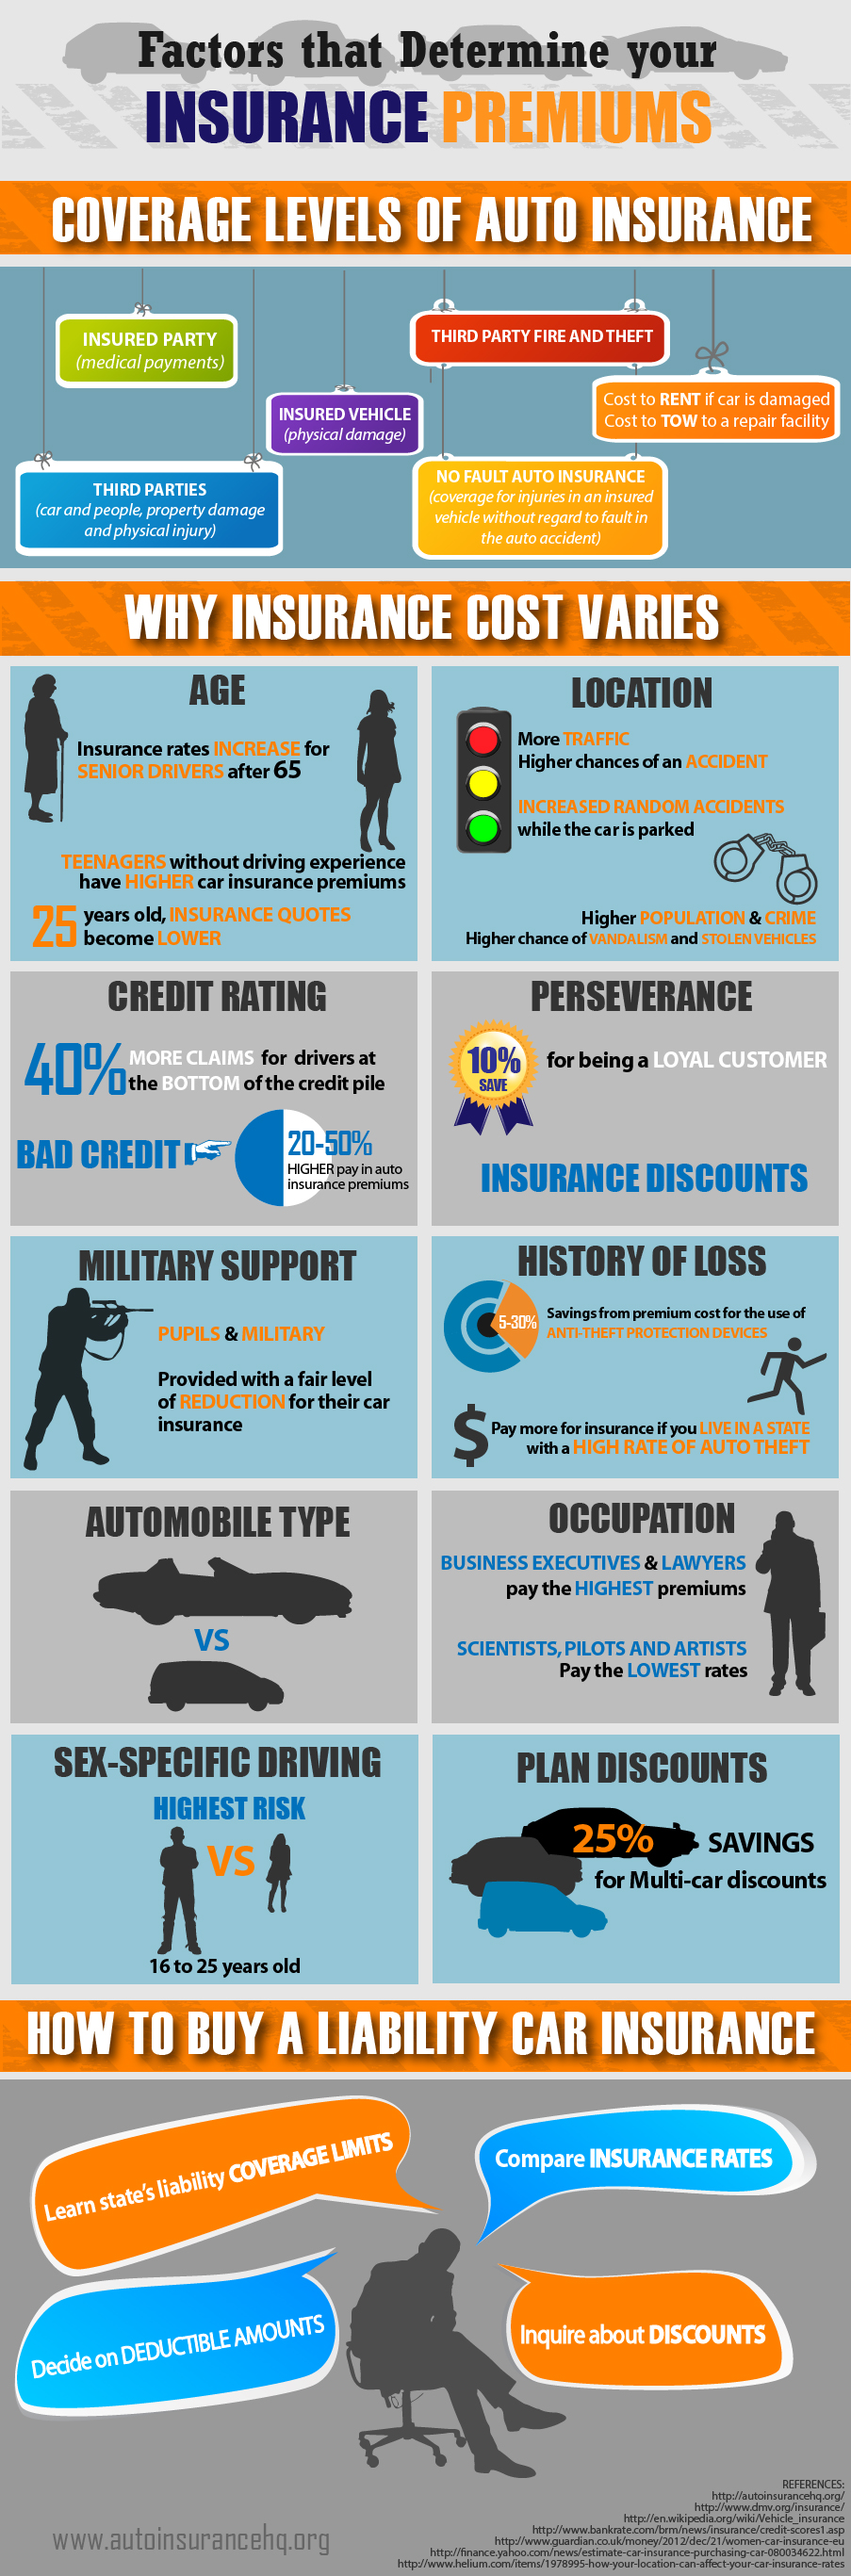 autoinsurancecostfactors